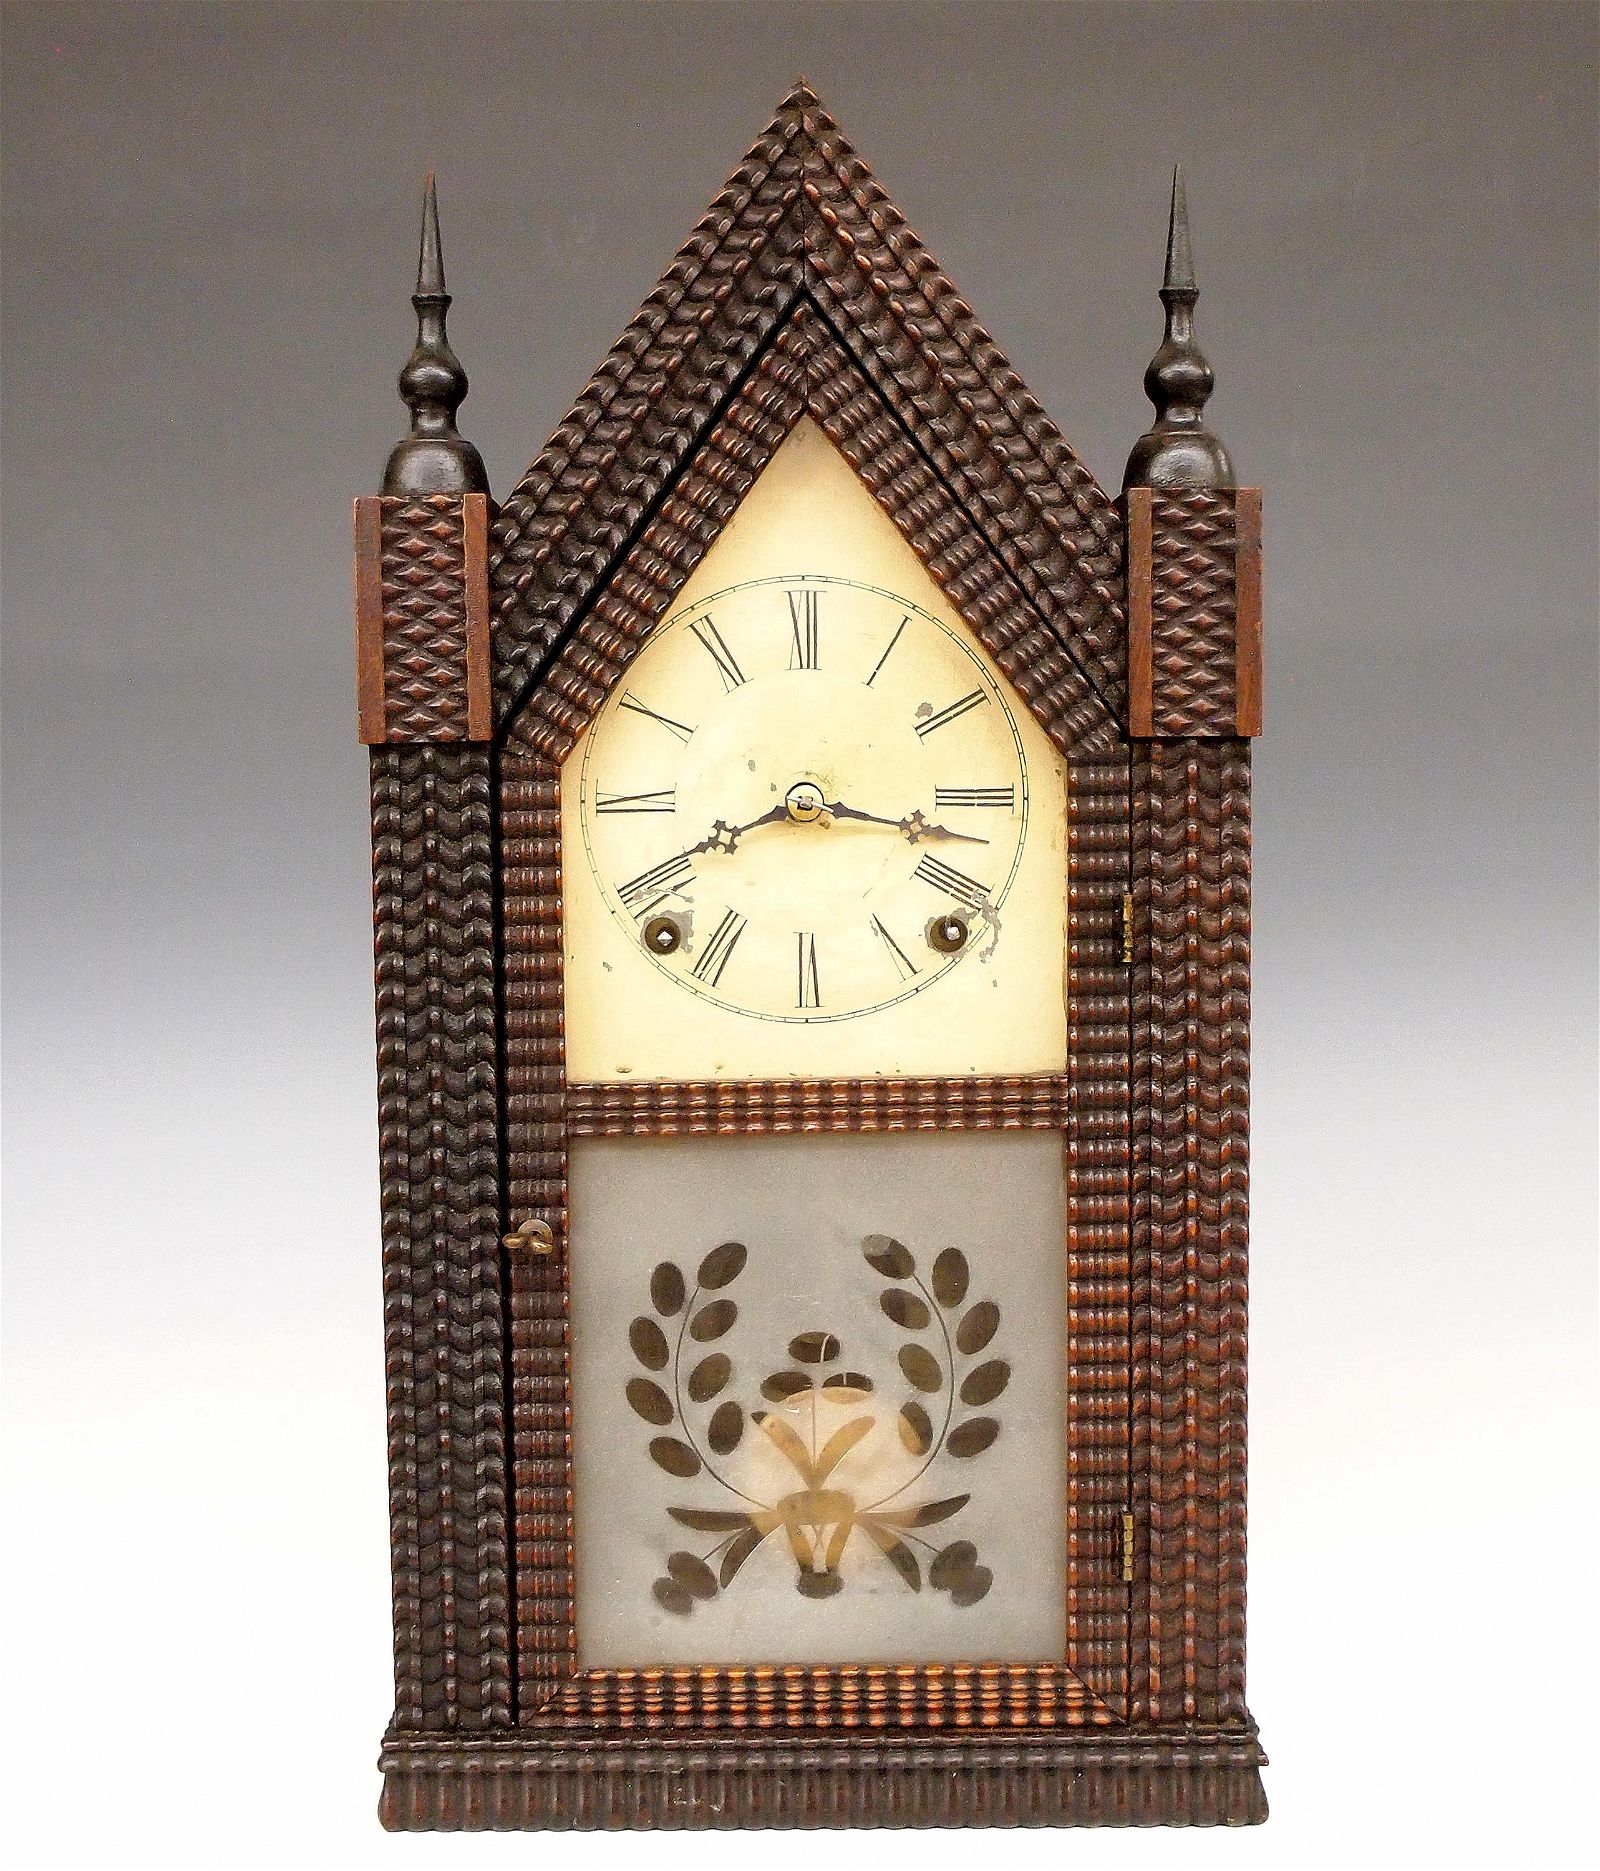 J.C. Brown Ripple Front Steeple Clock